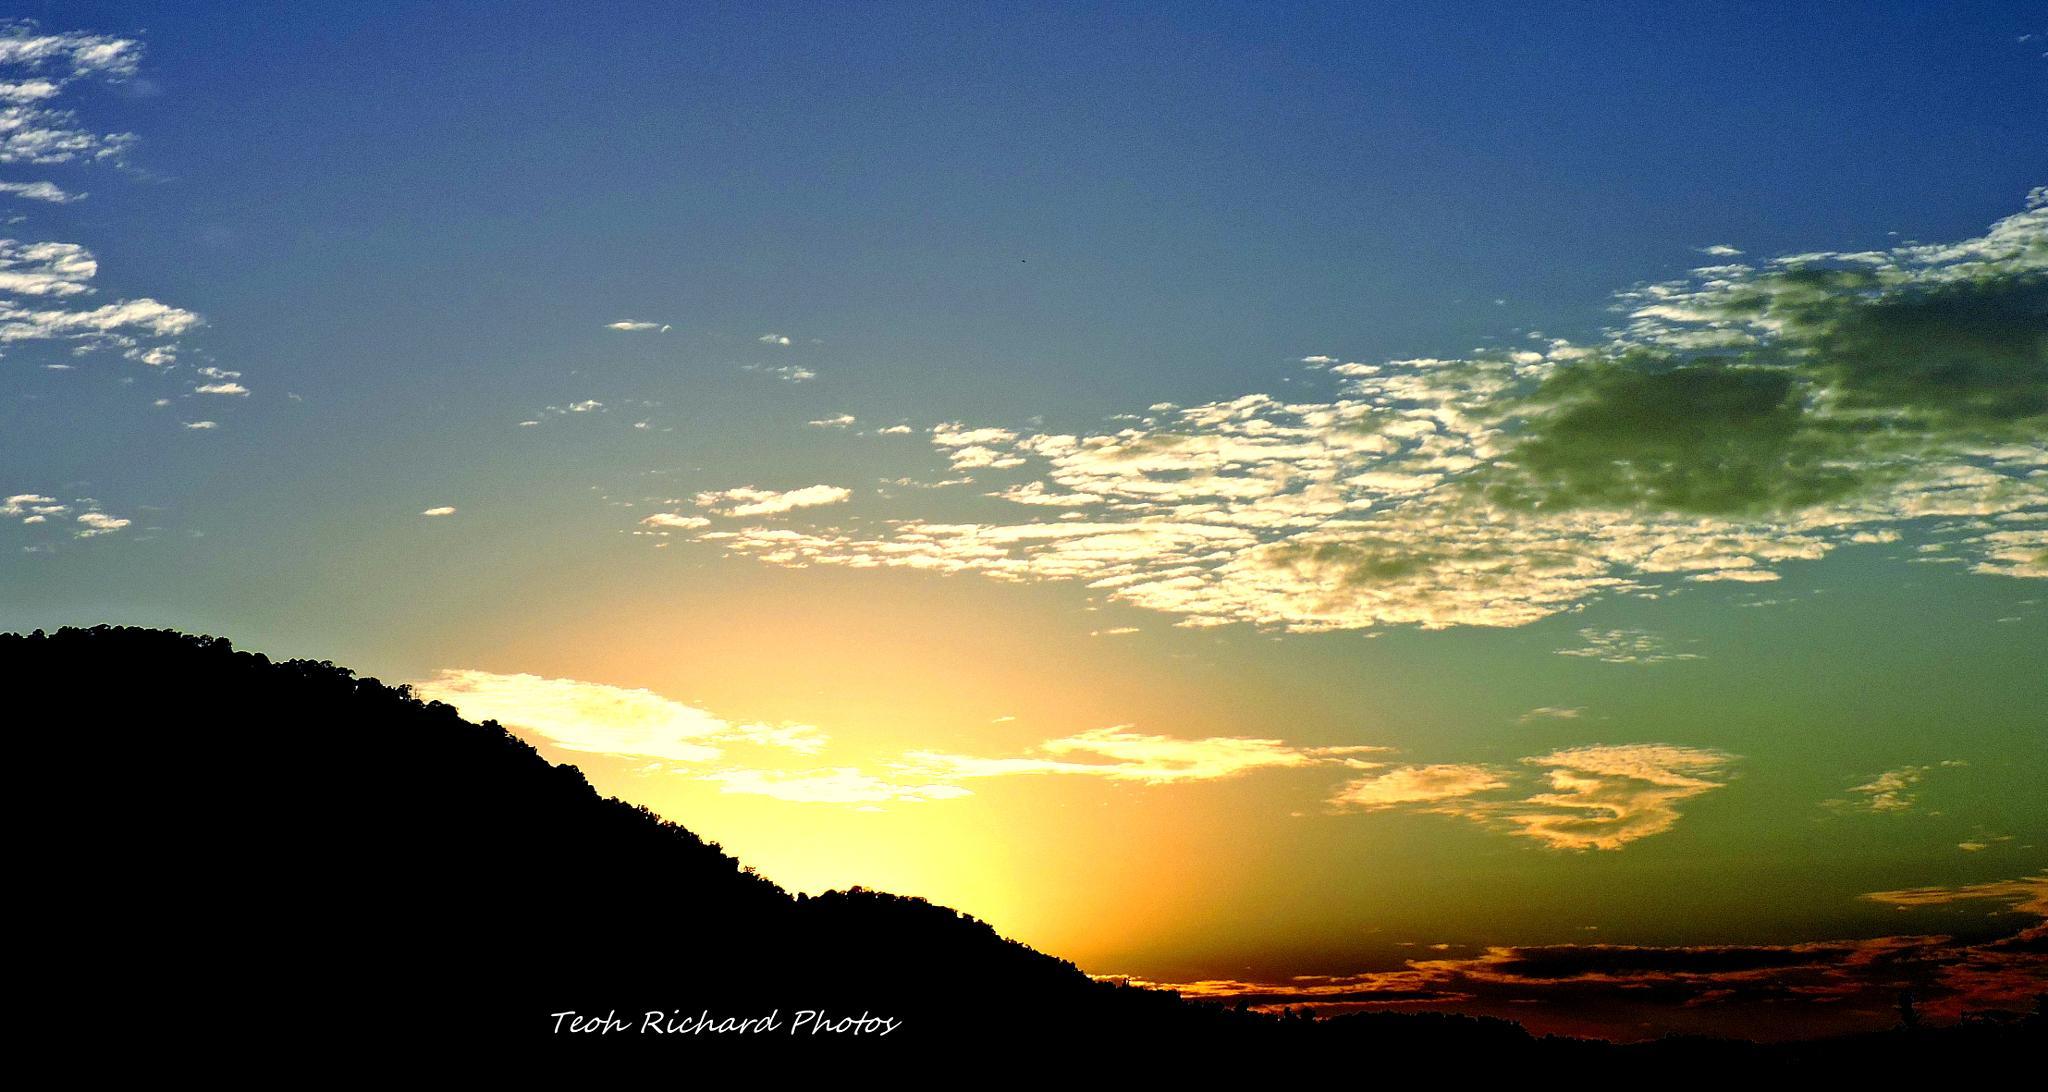 Sunrise 1 by teoh.richard.15